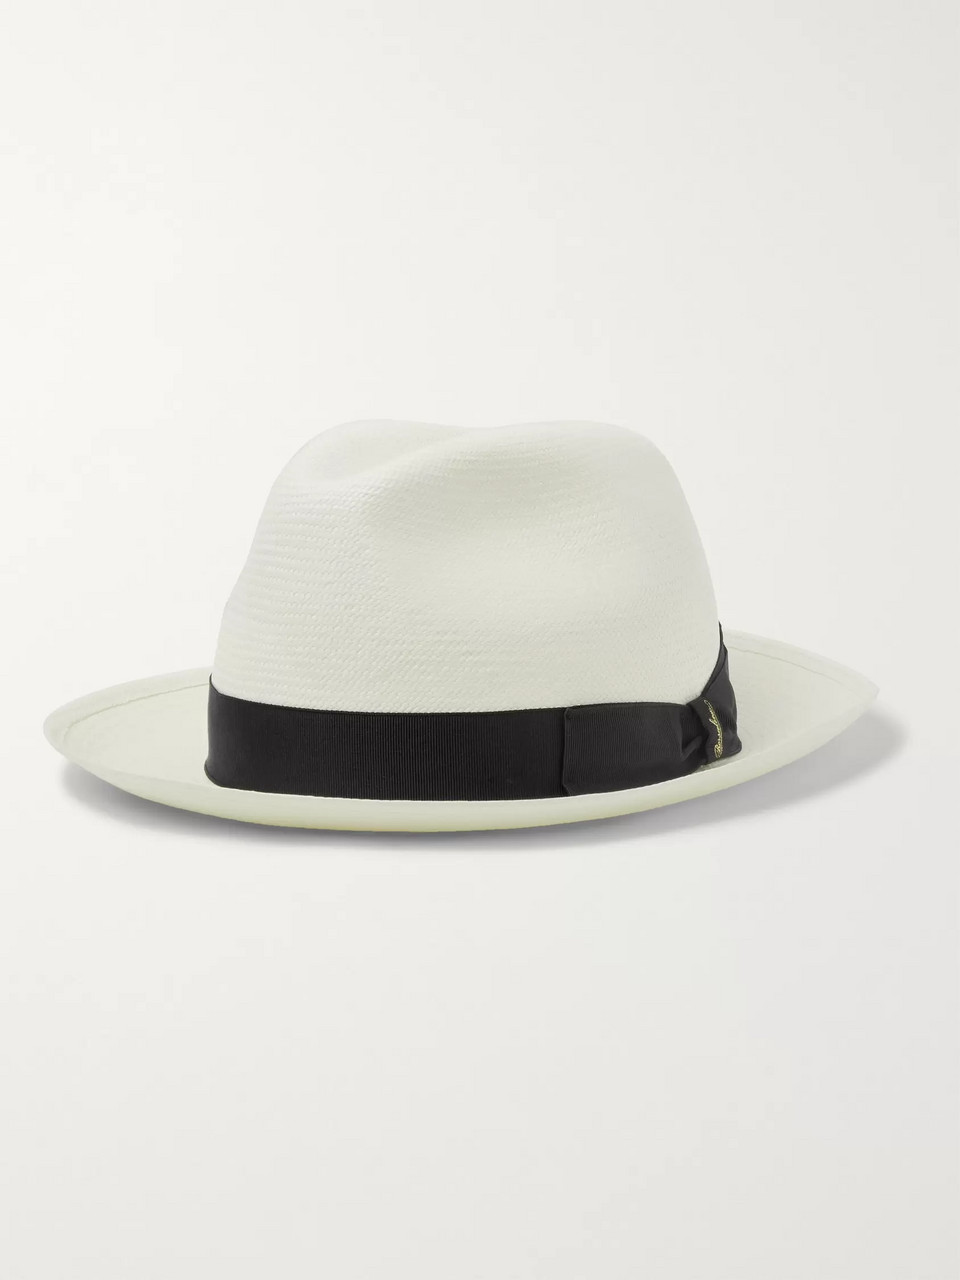 c7d1a62566f2b1 White Grosgrain-Trimmed Straw Panama Hat | Borsalino | MR PORTER